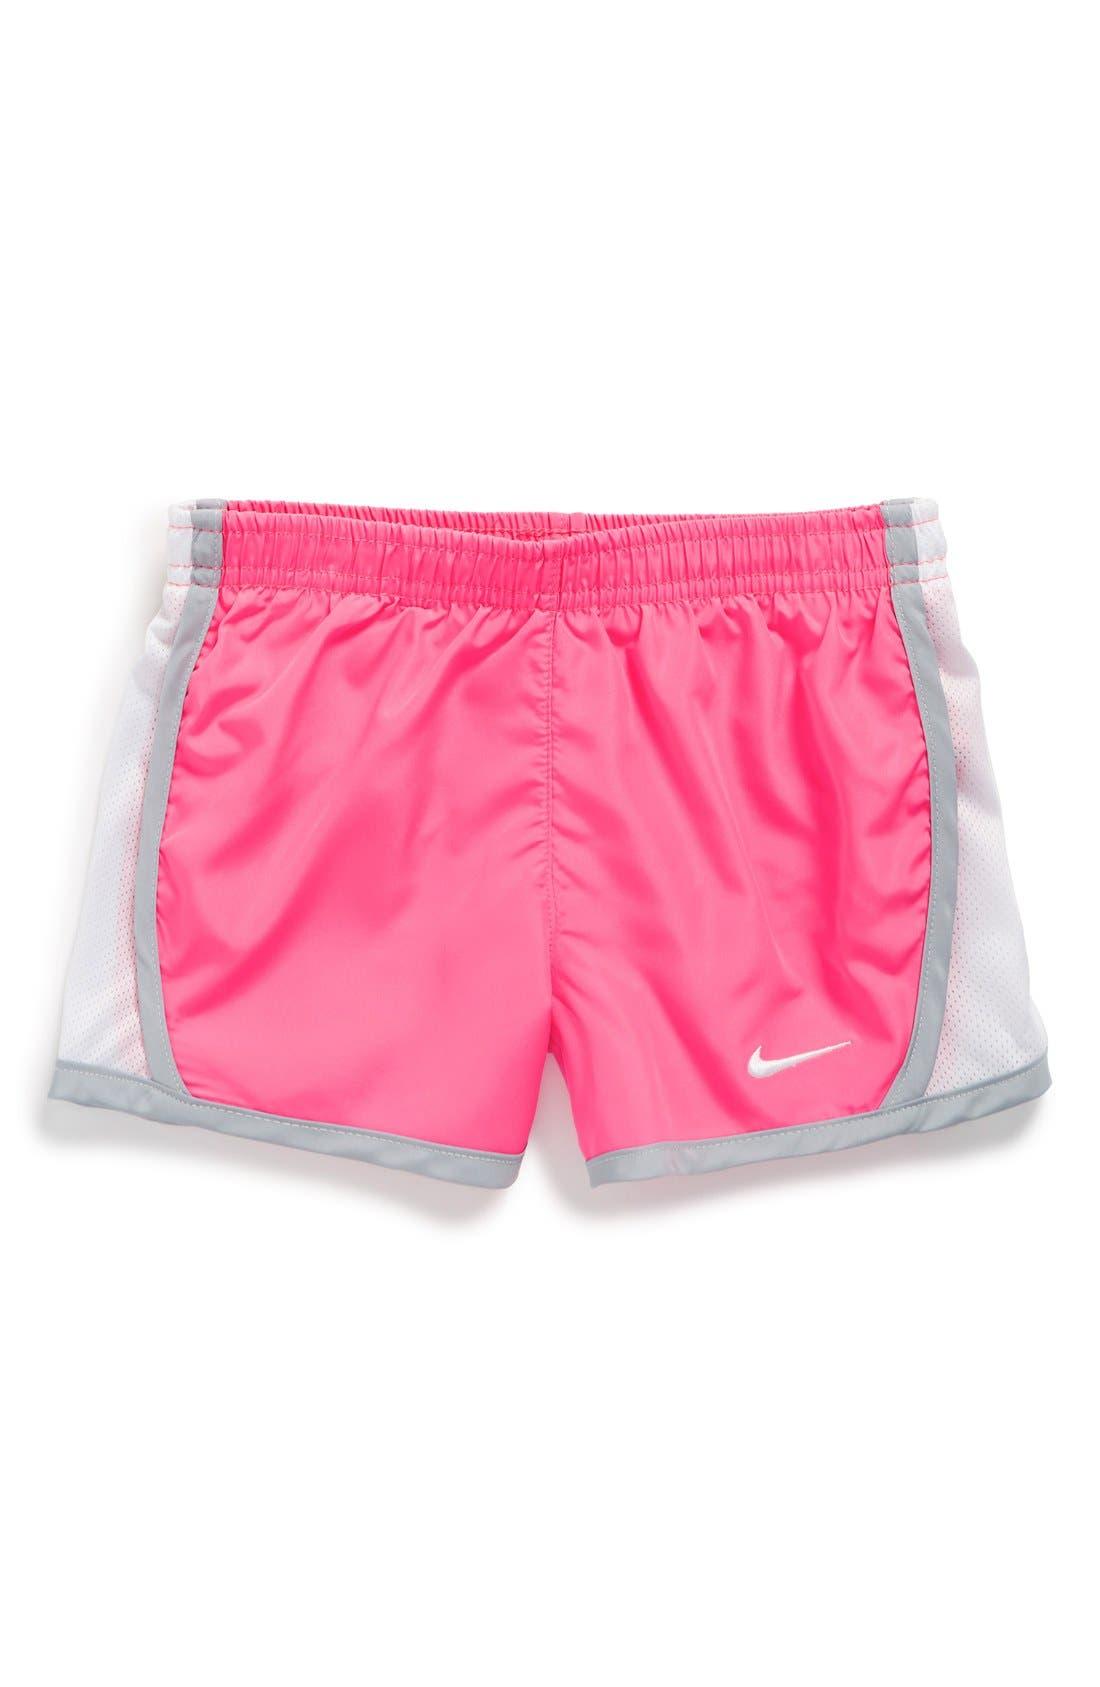 Tempo Dri-FIT Shorts,                             Main thumbnail 1, color,                             Pink Pow